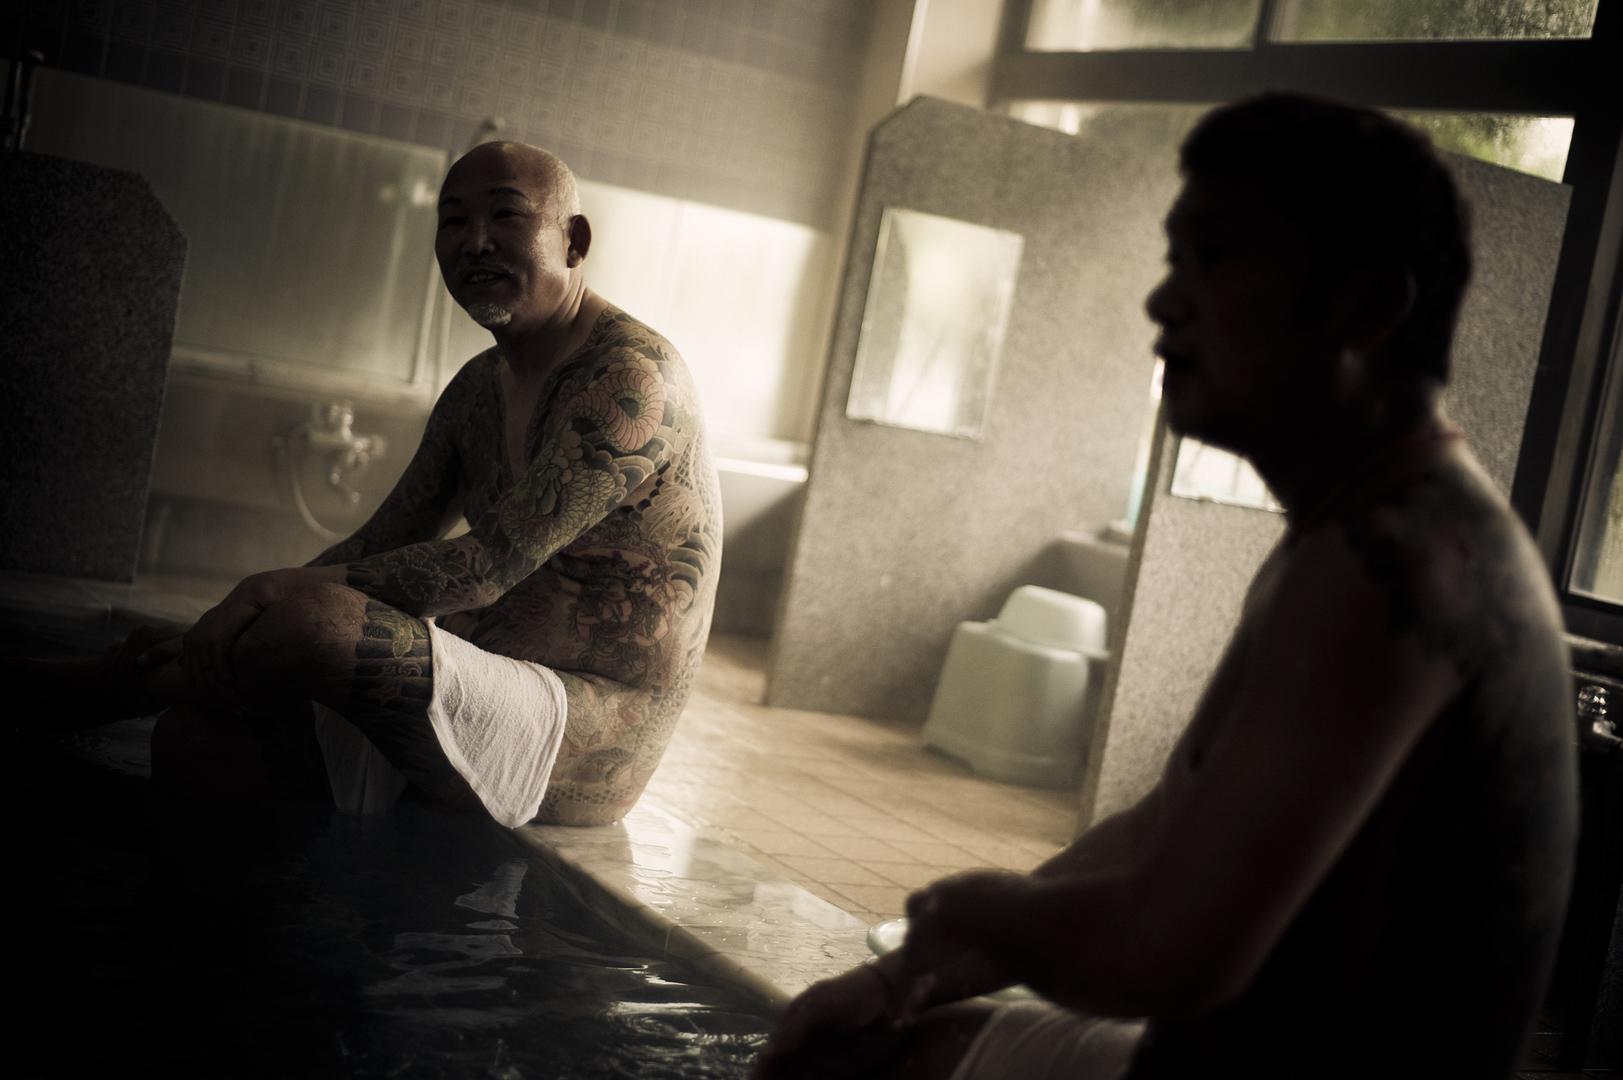 The bath house - © anton kusters 2009